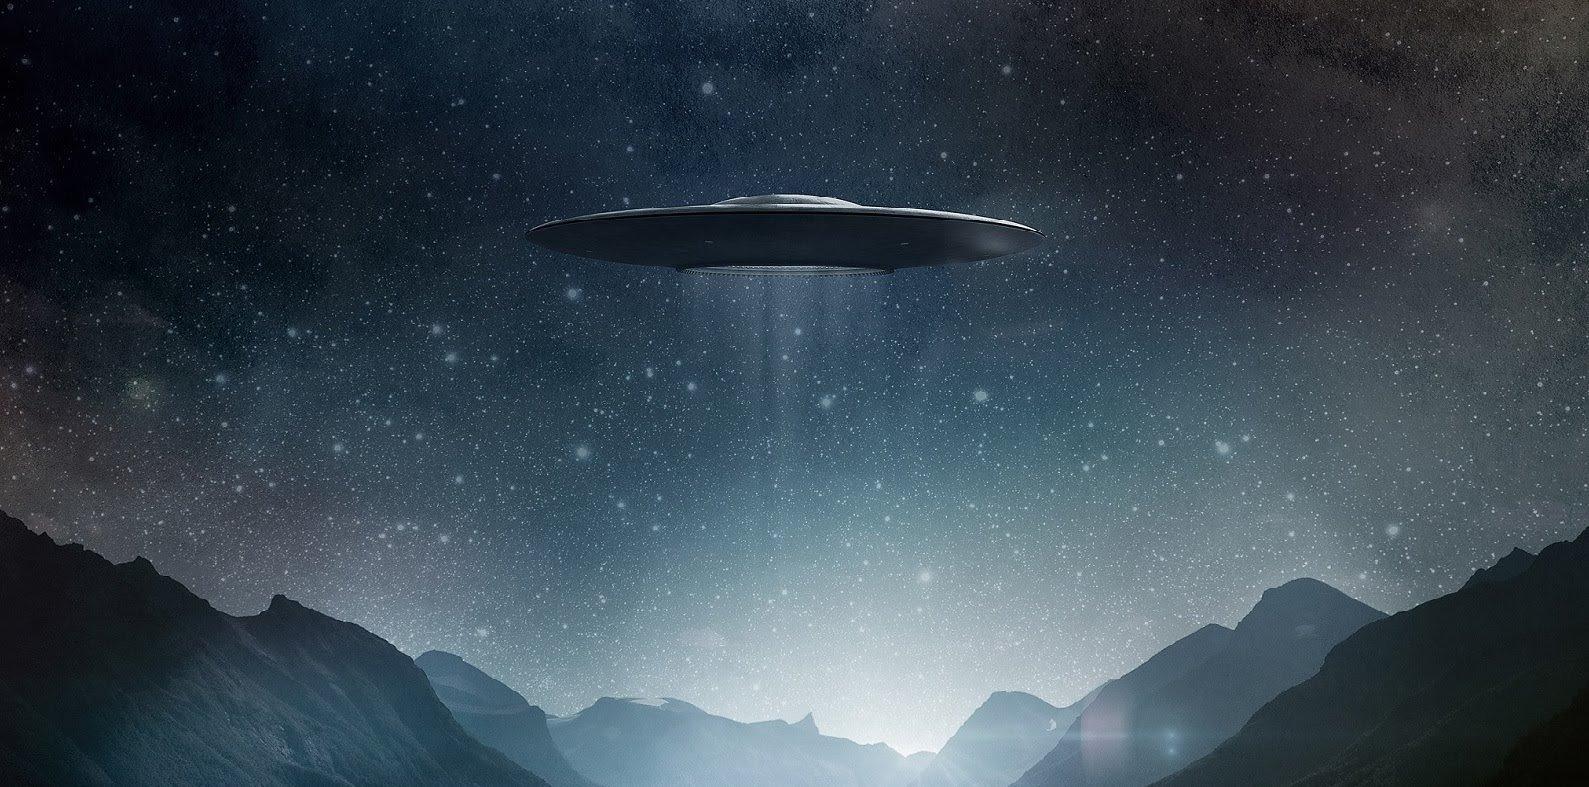 Удалось поймать НЛО?